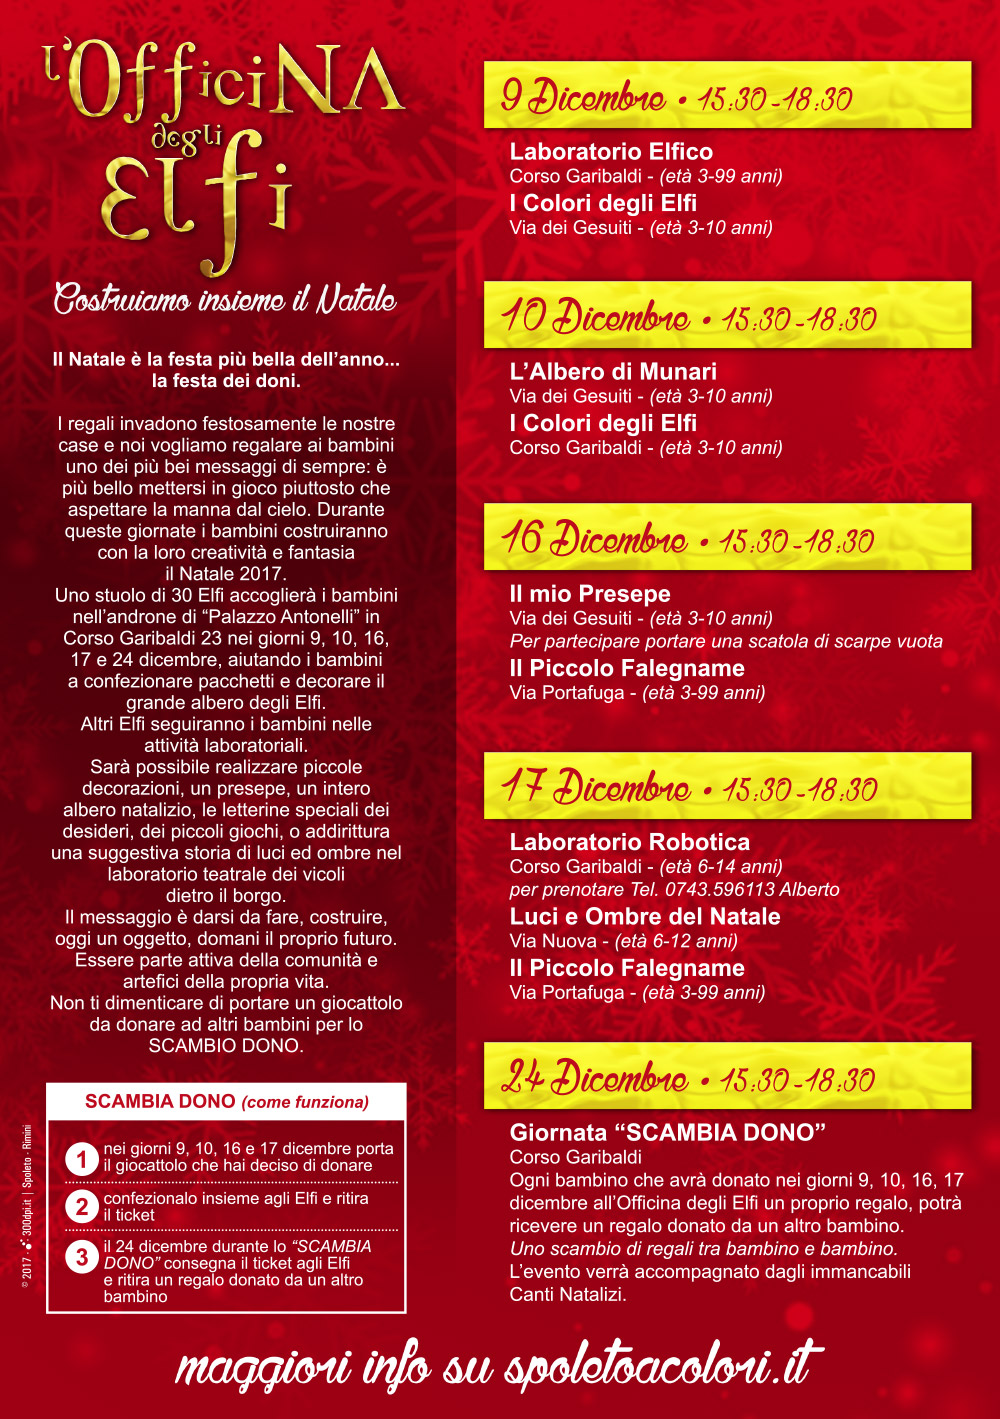 L'Officina degli Elfi - Programma - Spoleto 2017